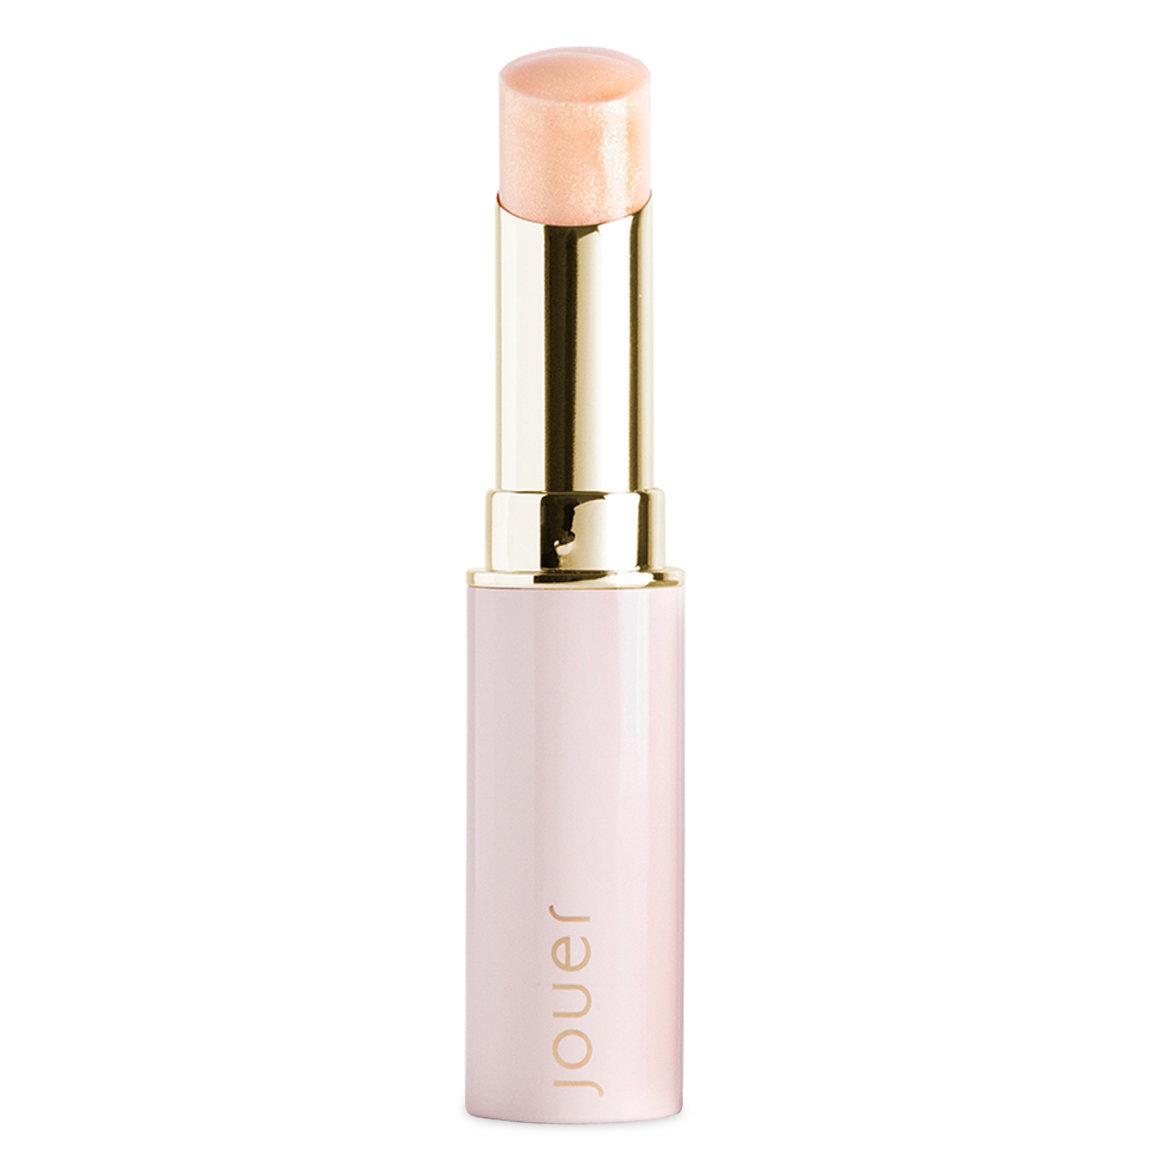 Jouer Cosmetics Essential Lip Enhancer Shine Balm Champagne Kiss alternative view 1.